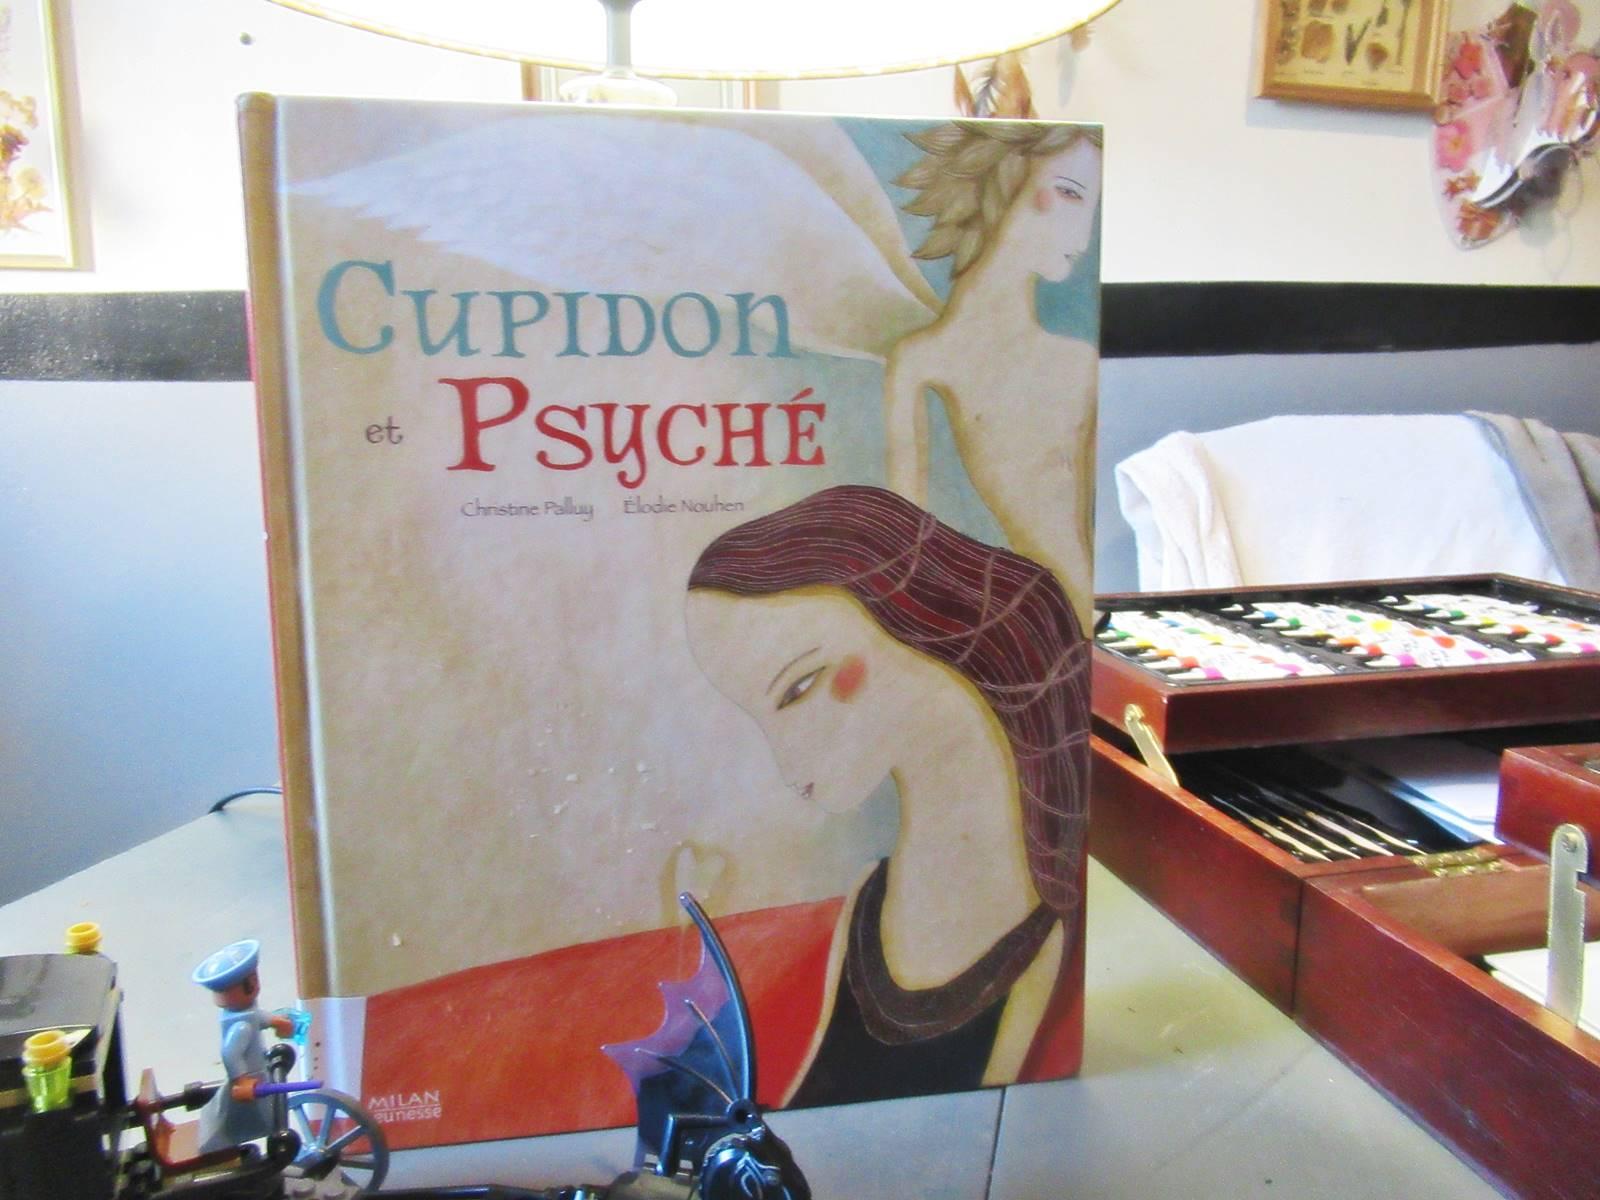 Psyche et cupidon livre milan jeunesse 2